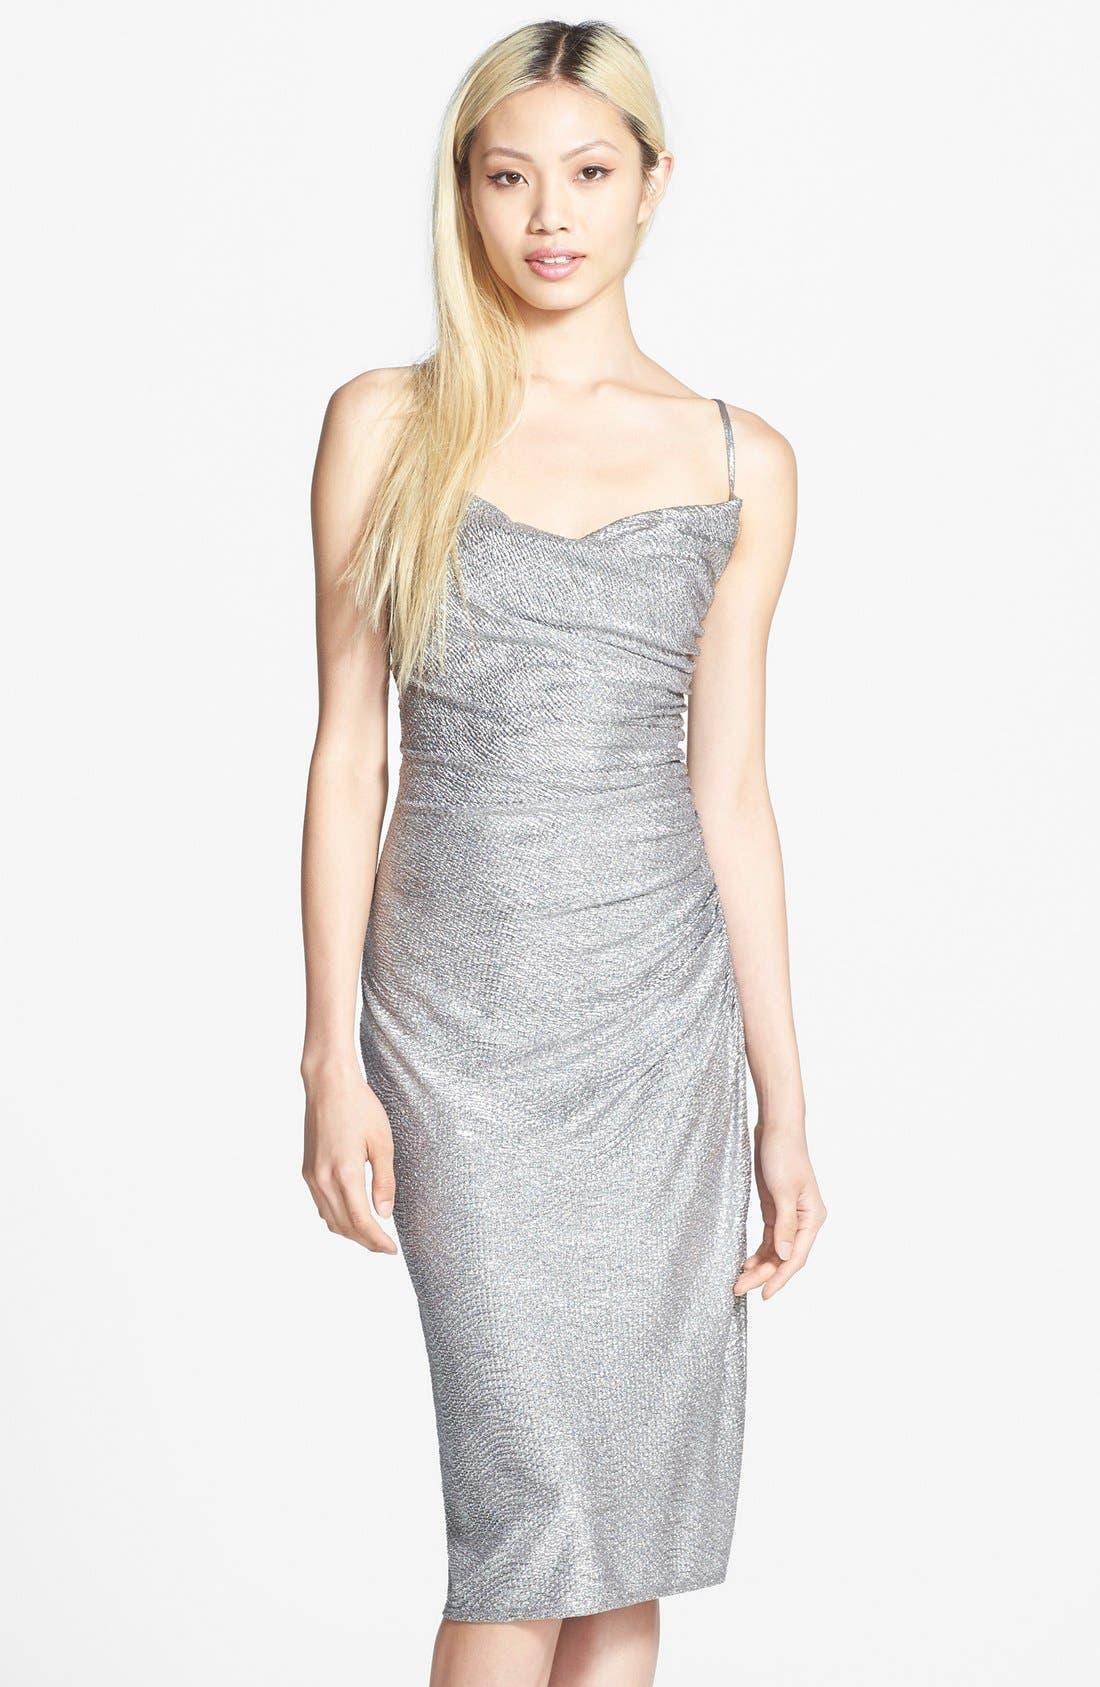 Laundry by Shelli Segal Metallic Shirred Dress